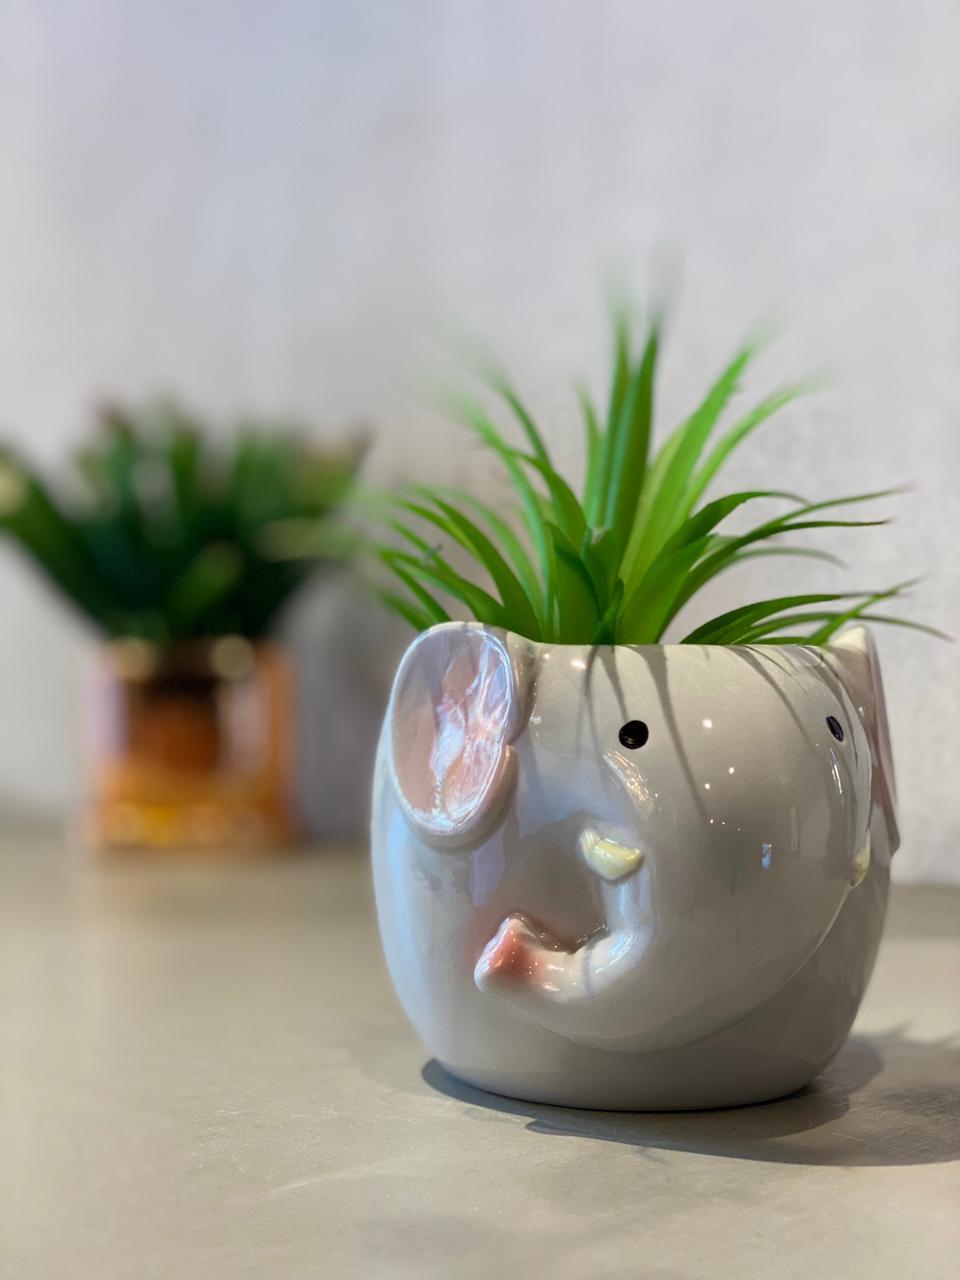 Vaso Decorativo Pets Colection: Elefante - La Fleur